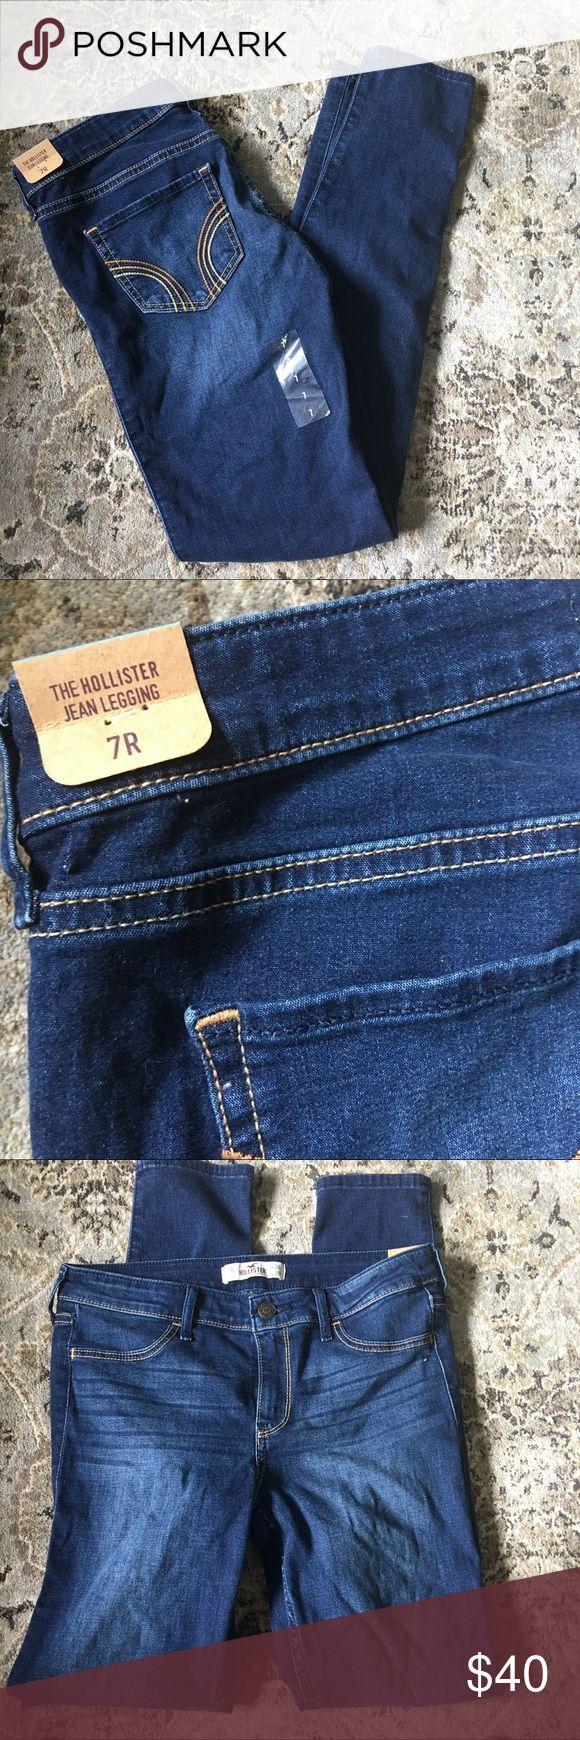 Hollister Legging jeans NWT Hollister Jeans